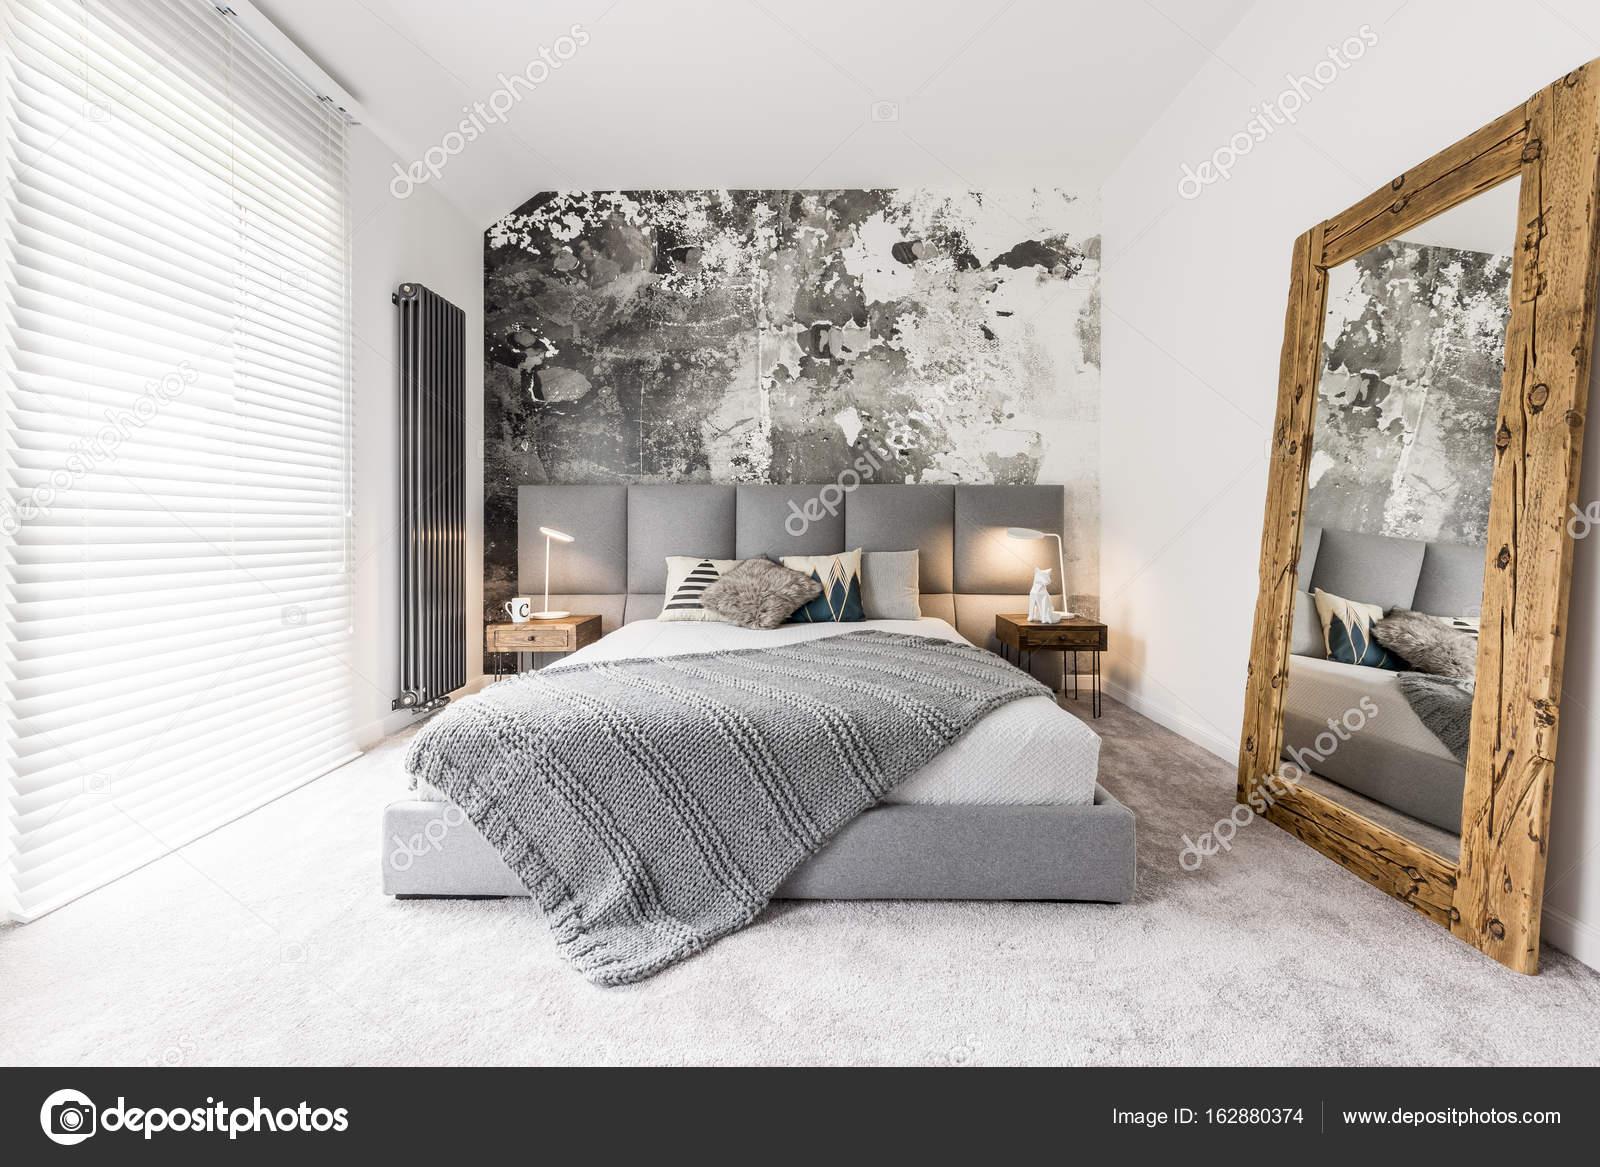 Grote Spiegel Hout : Slaapkamer met grote houten spiegel u2014 stockfoto © photographee.eu